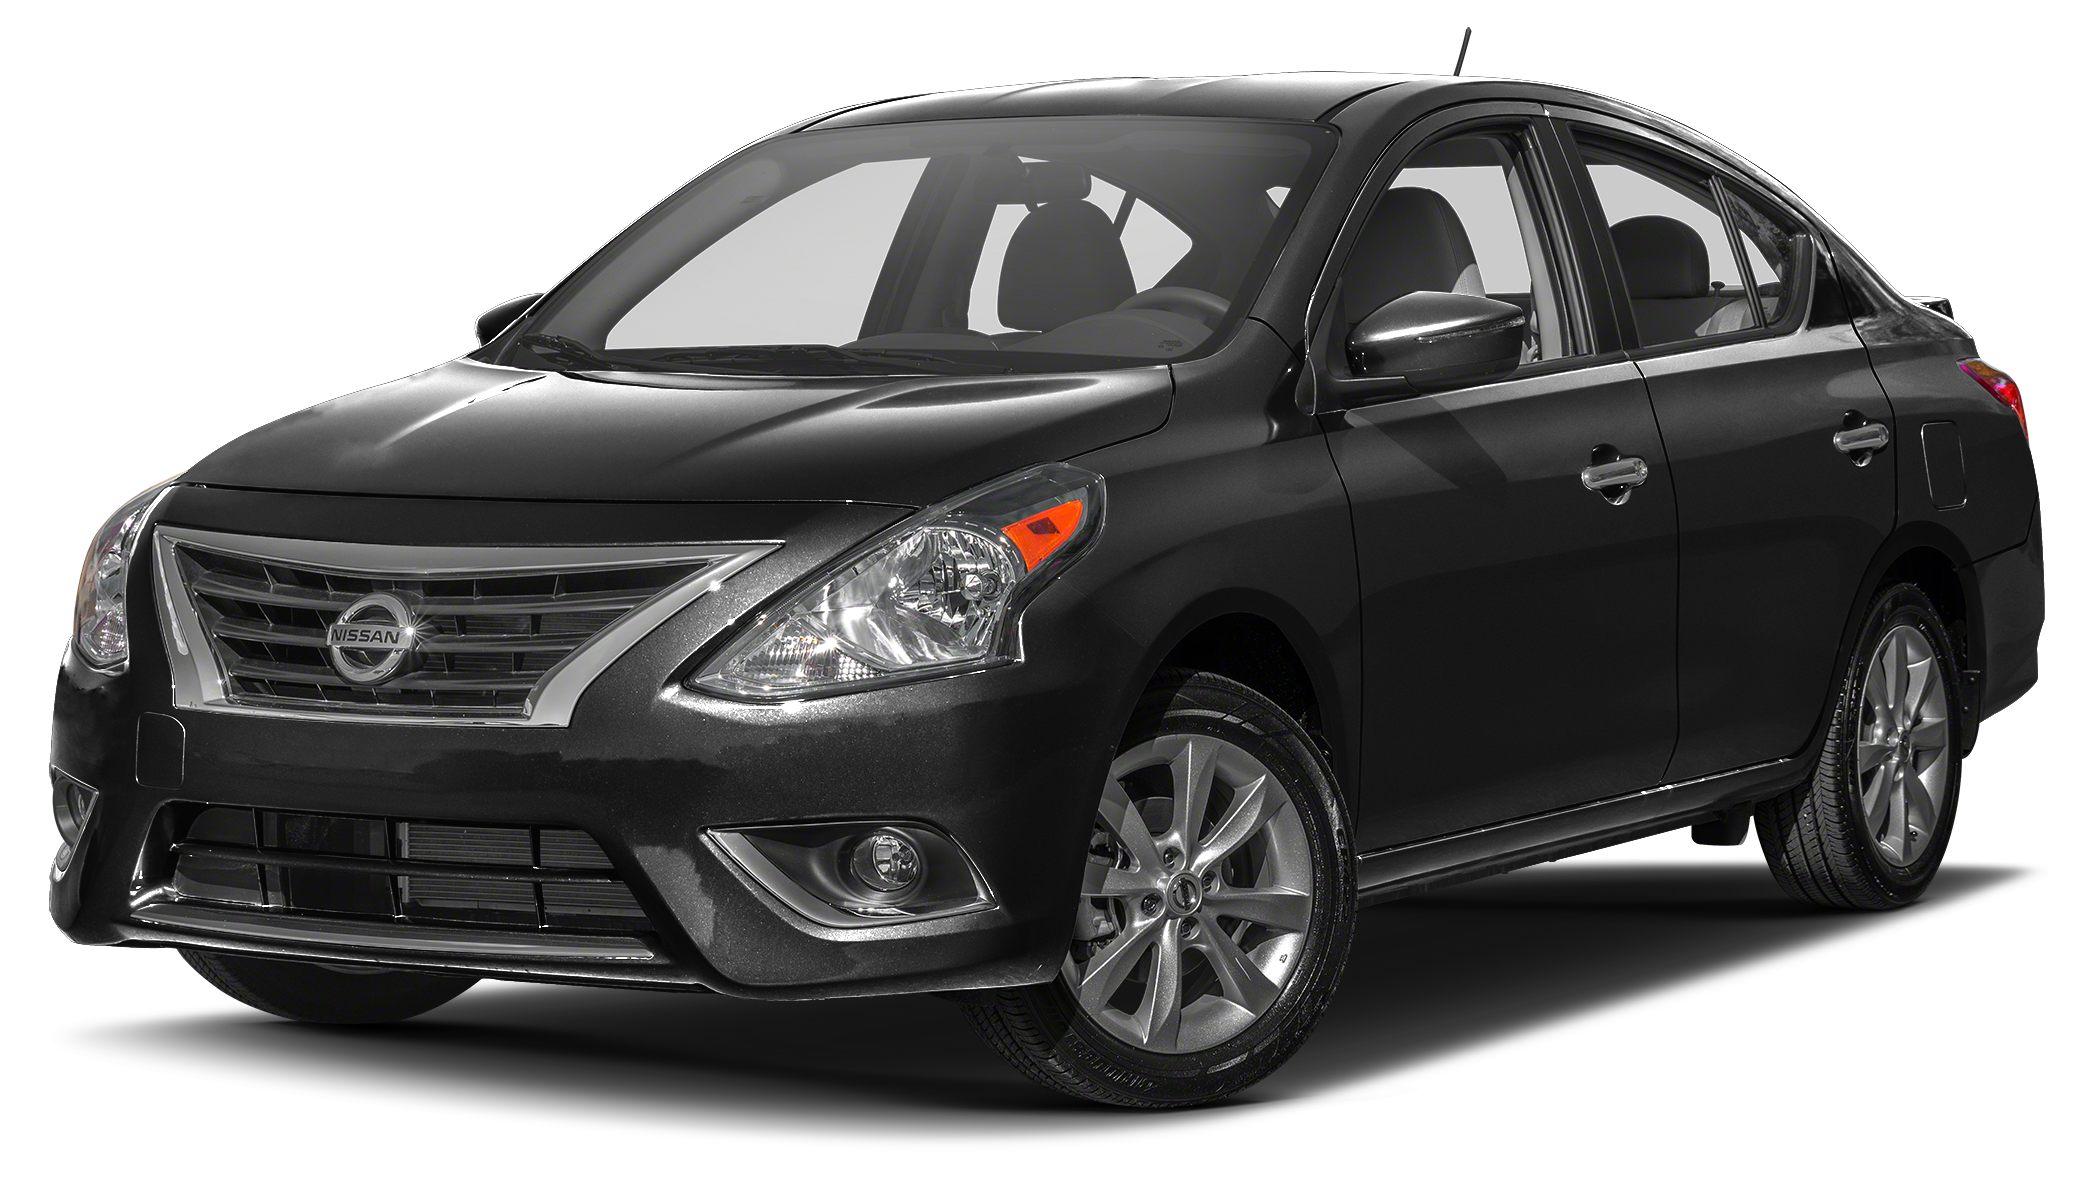 2016 Nissan Versa 16 SL Miles 7Color Super Black Stock 16V338 VIN 3N1CN7APXGL860149